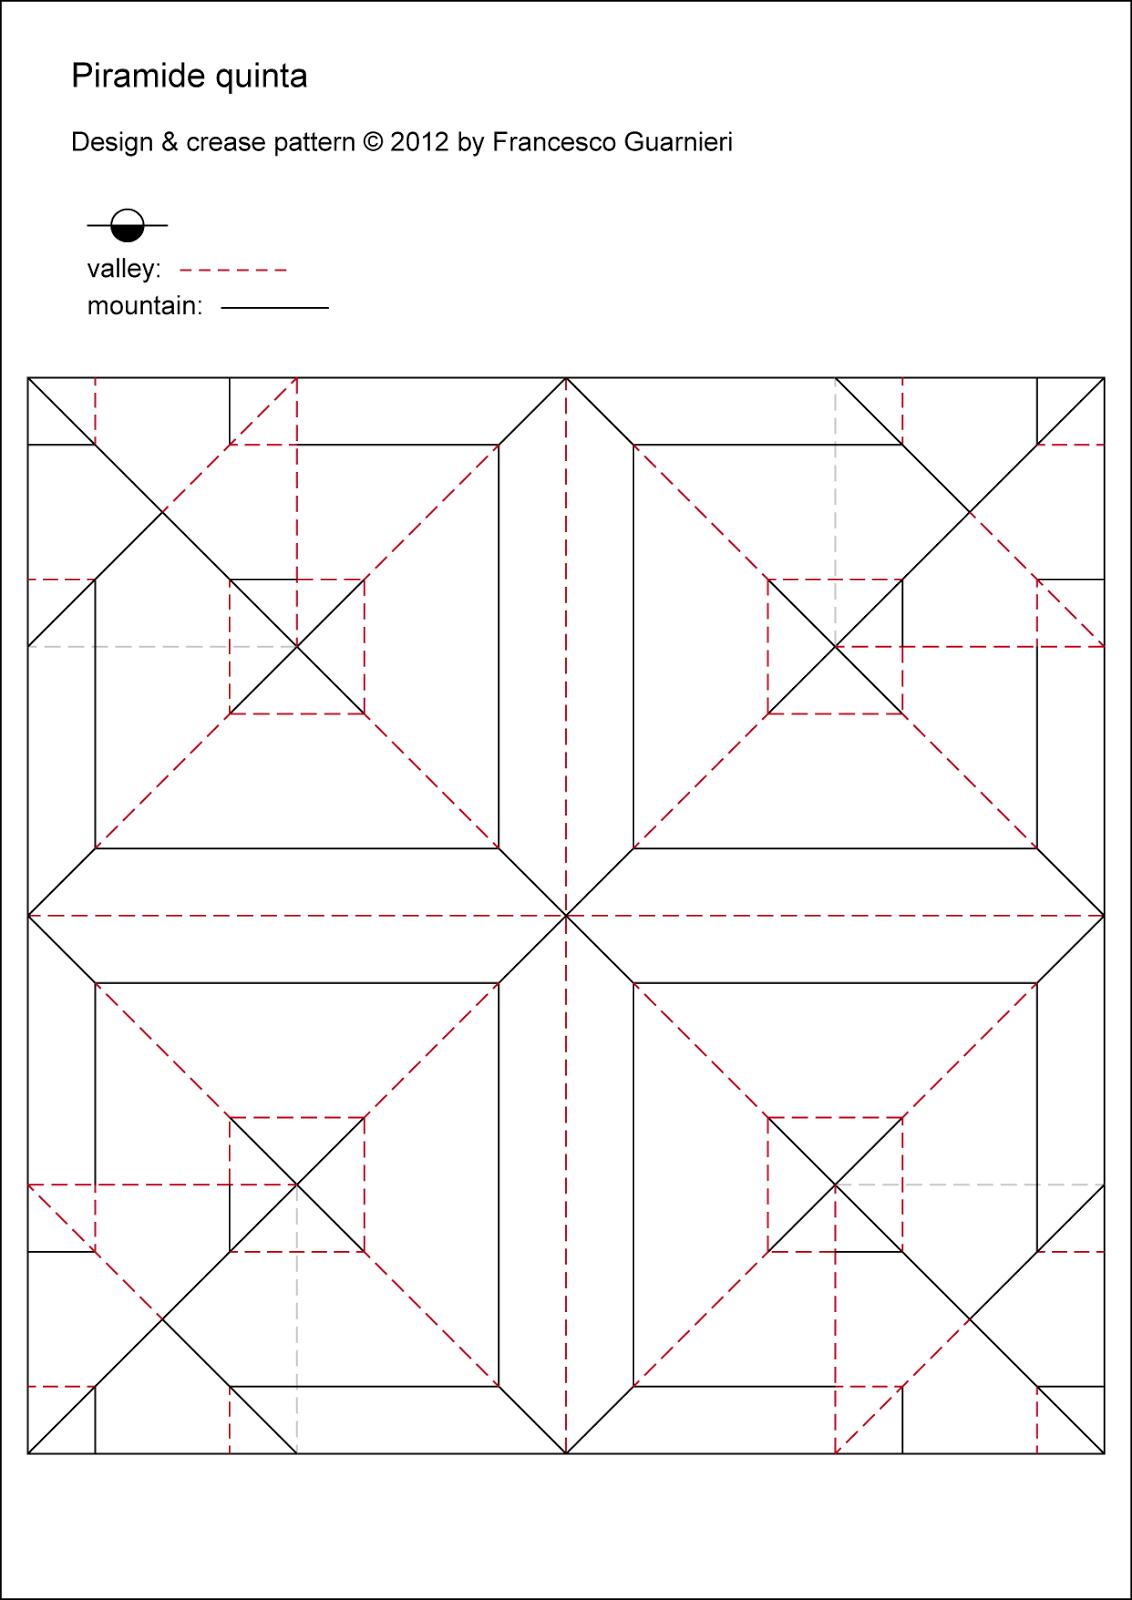 Origami CP Piramide quinta - Fourth pyramid by Francesco Guarnieri